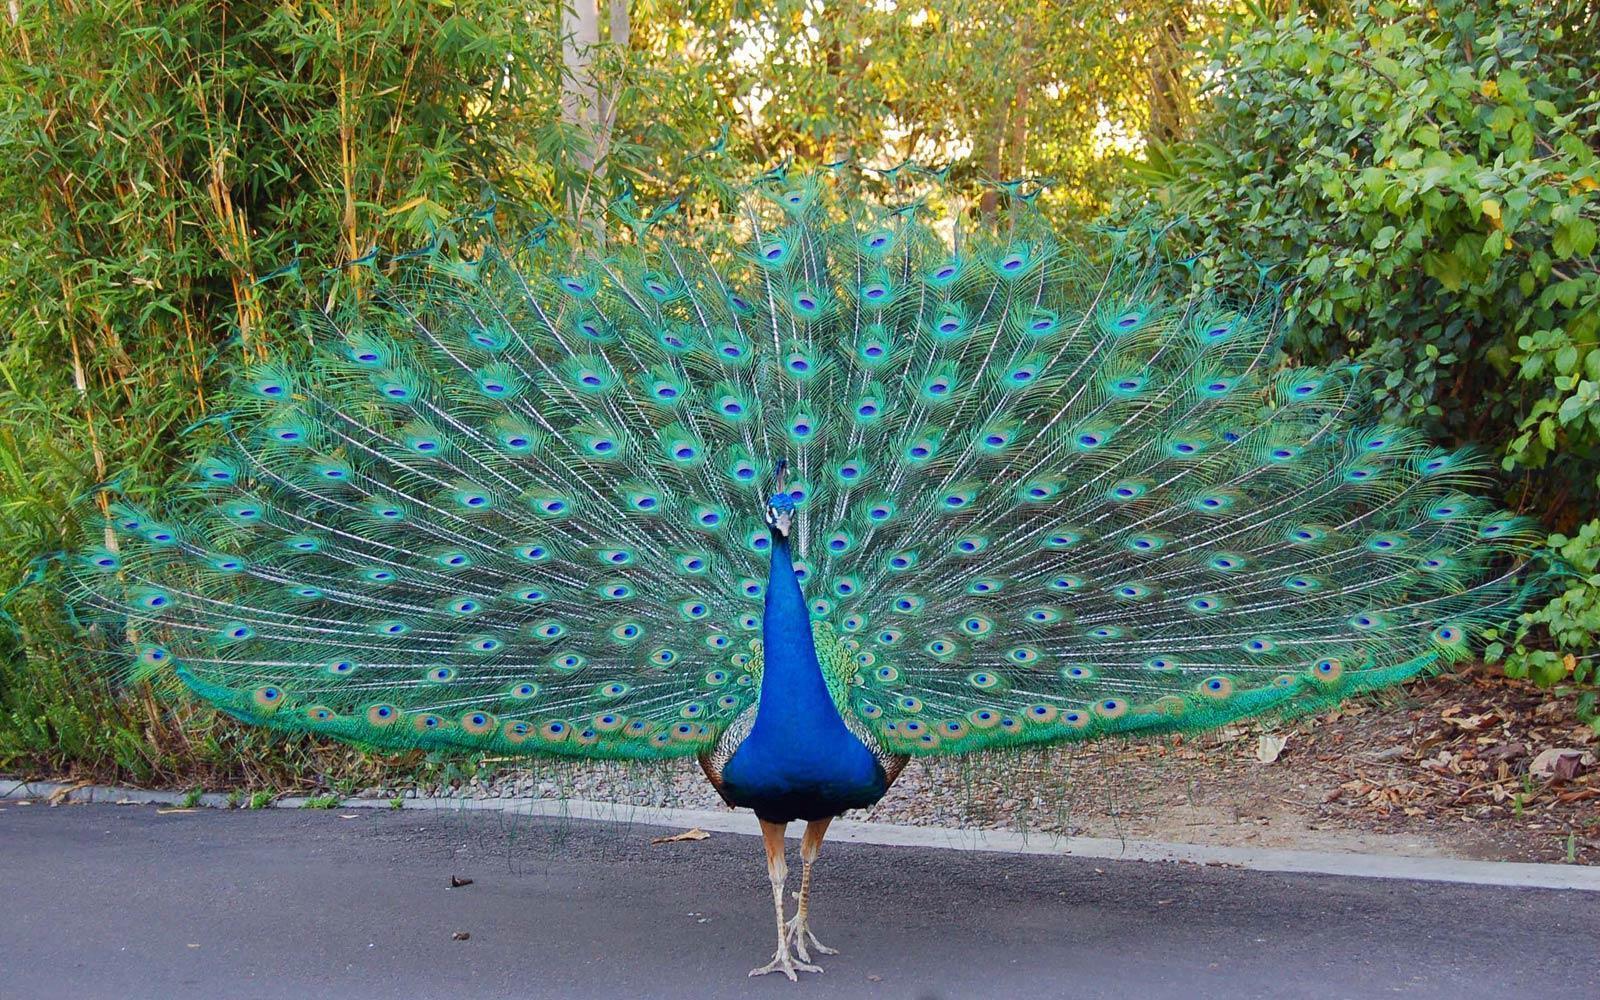 peacock images hd wallpaper